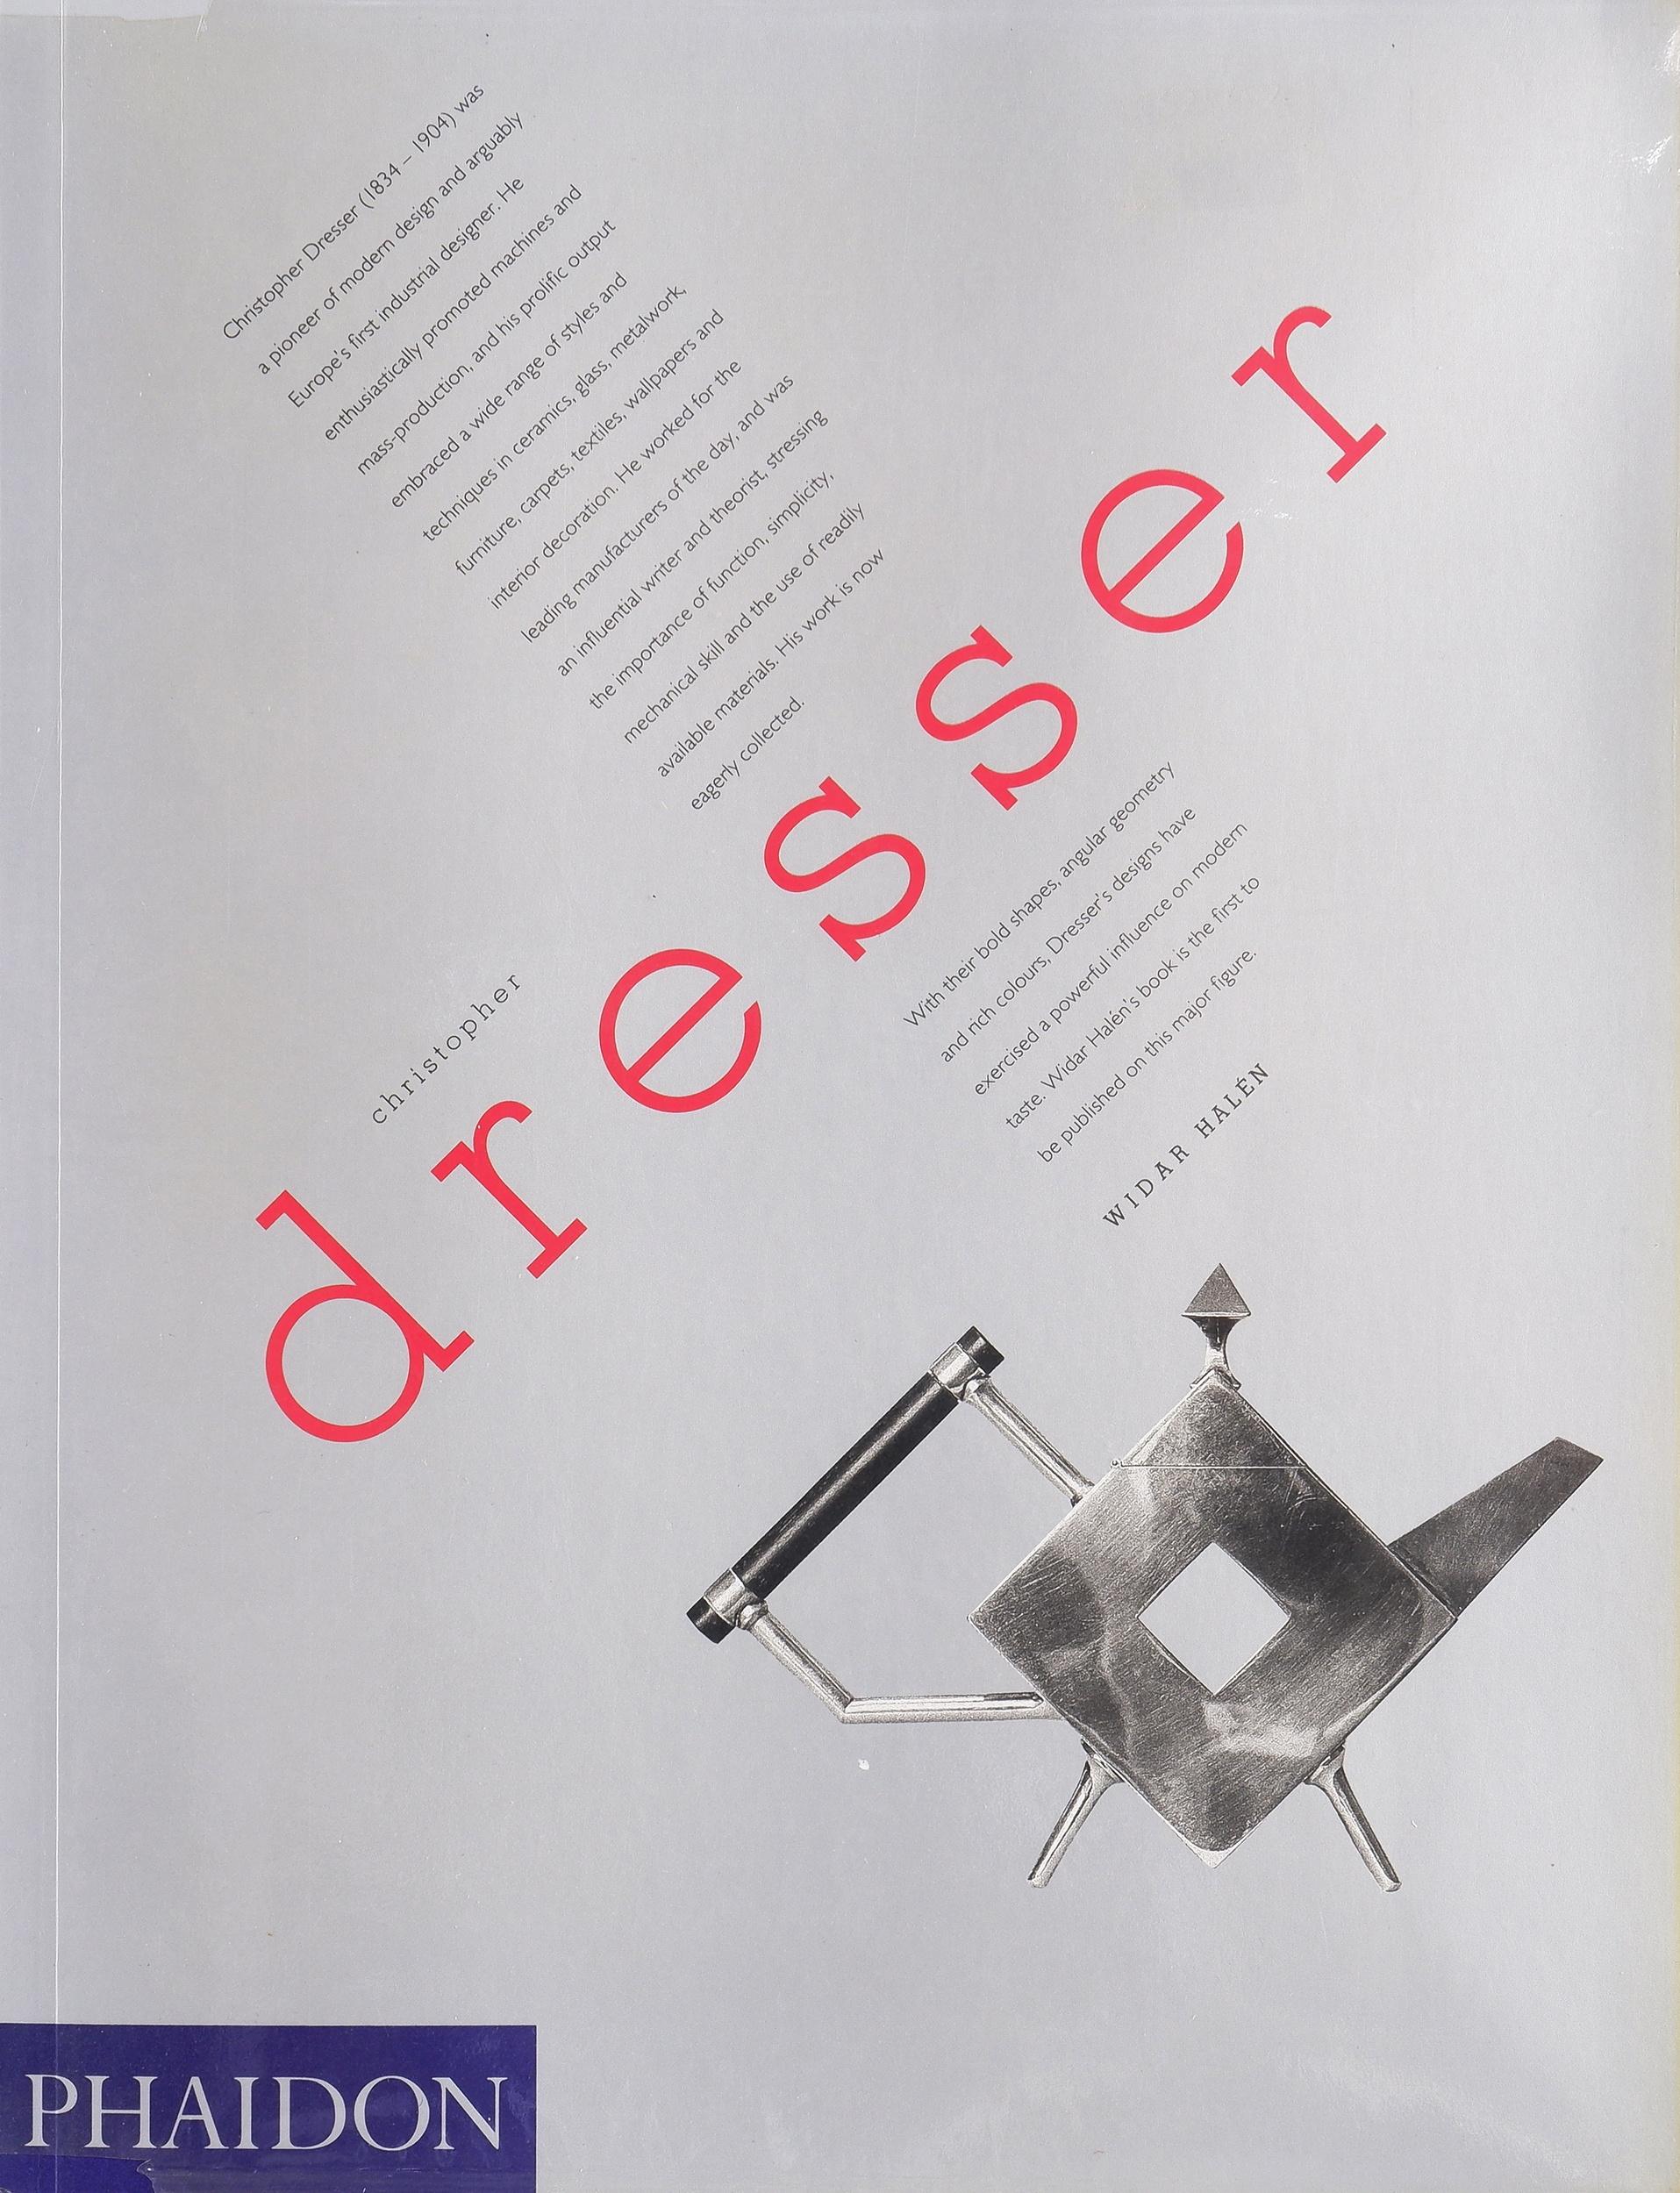 'Widar Halen, Christopher Dresser, Phaidon'